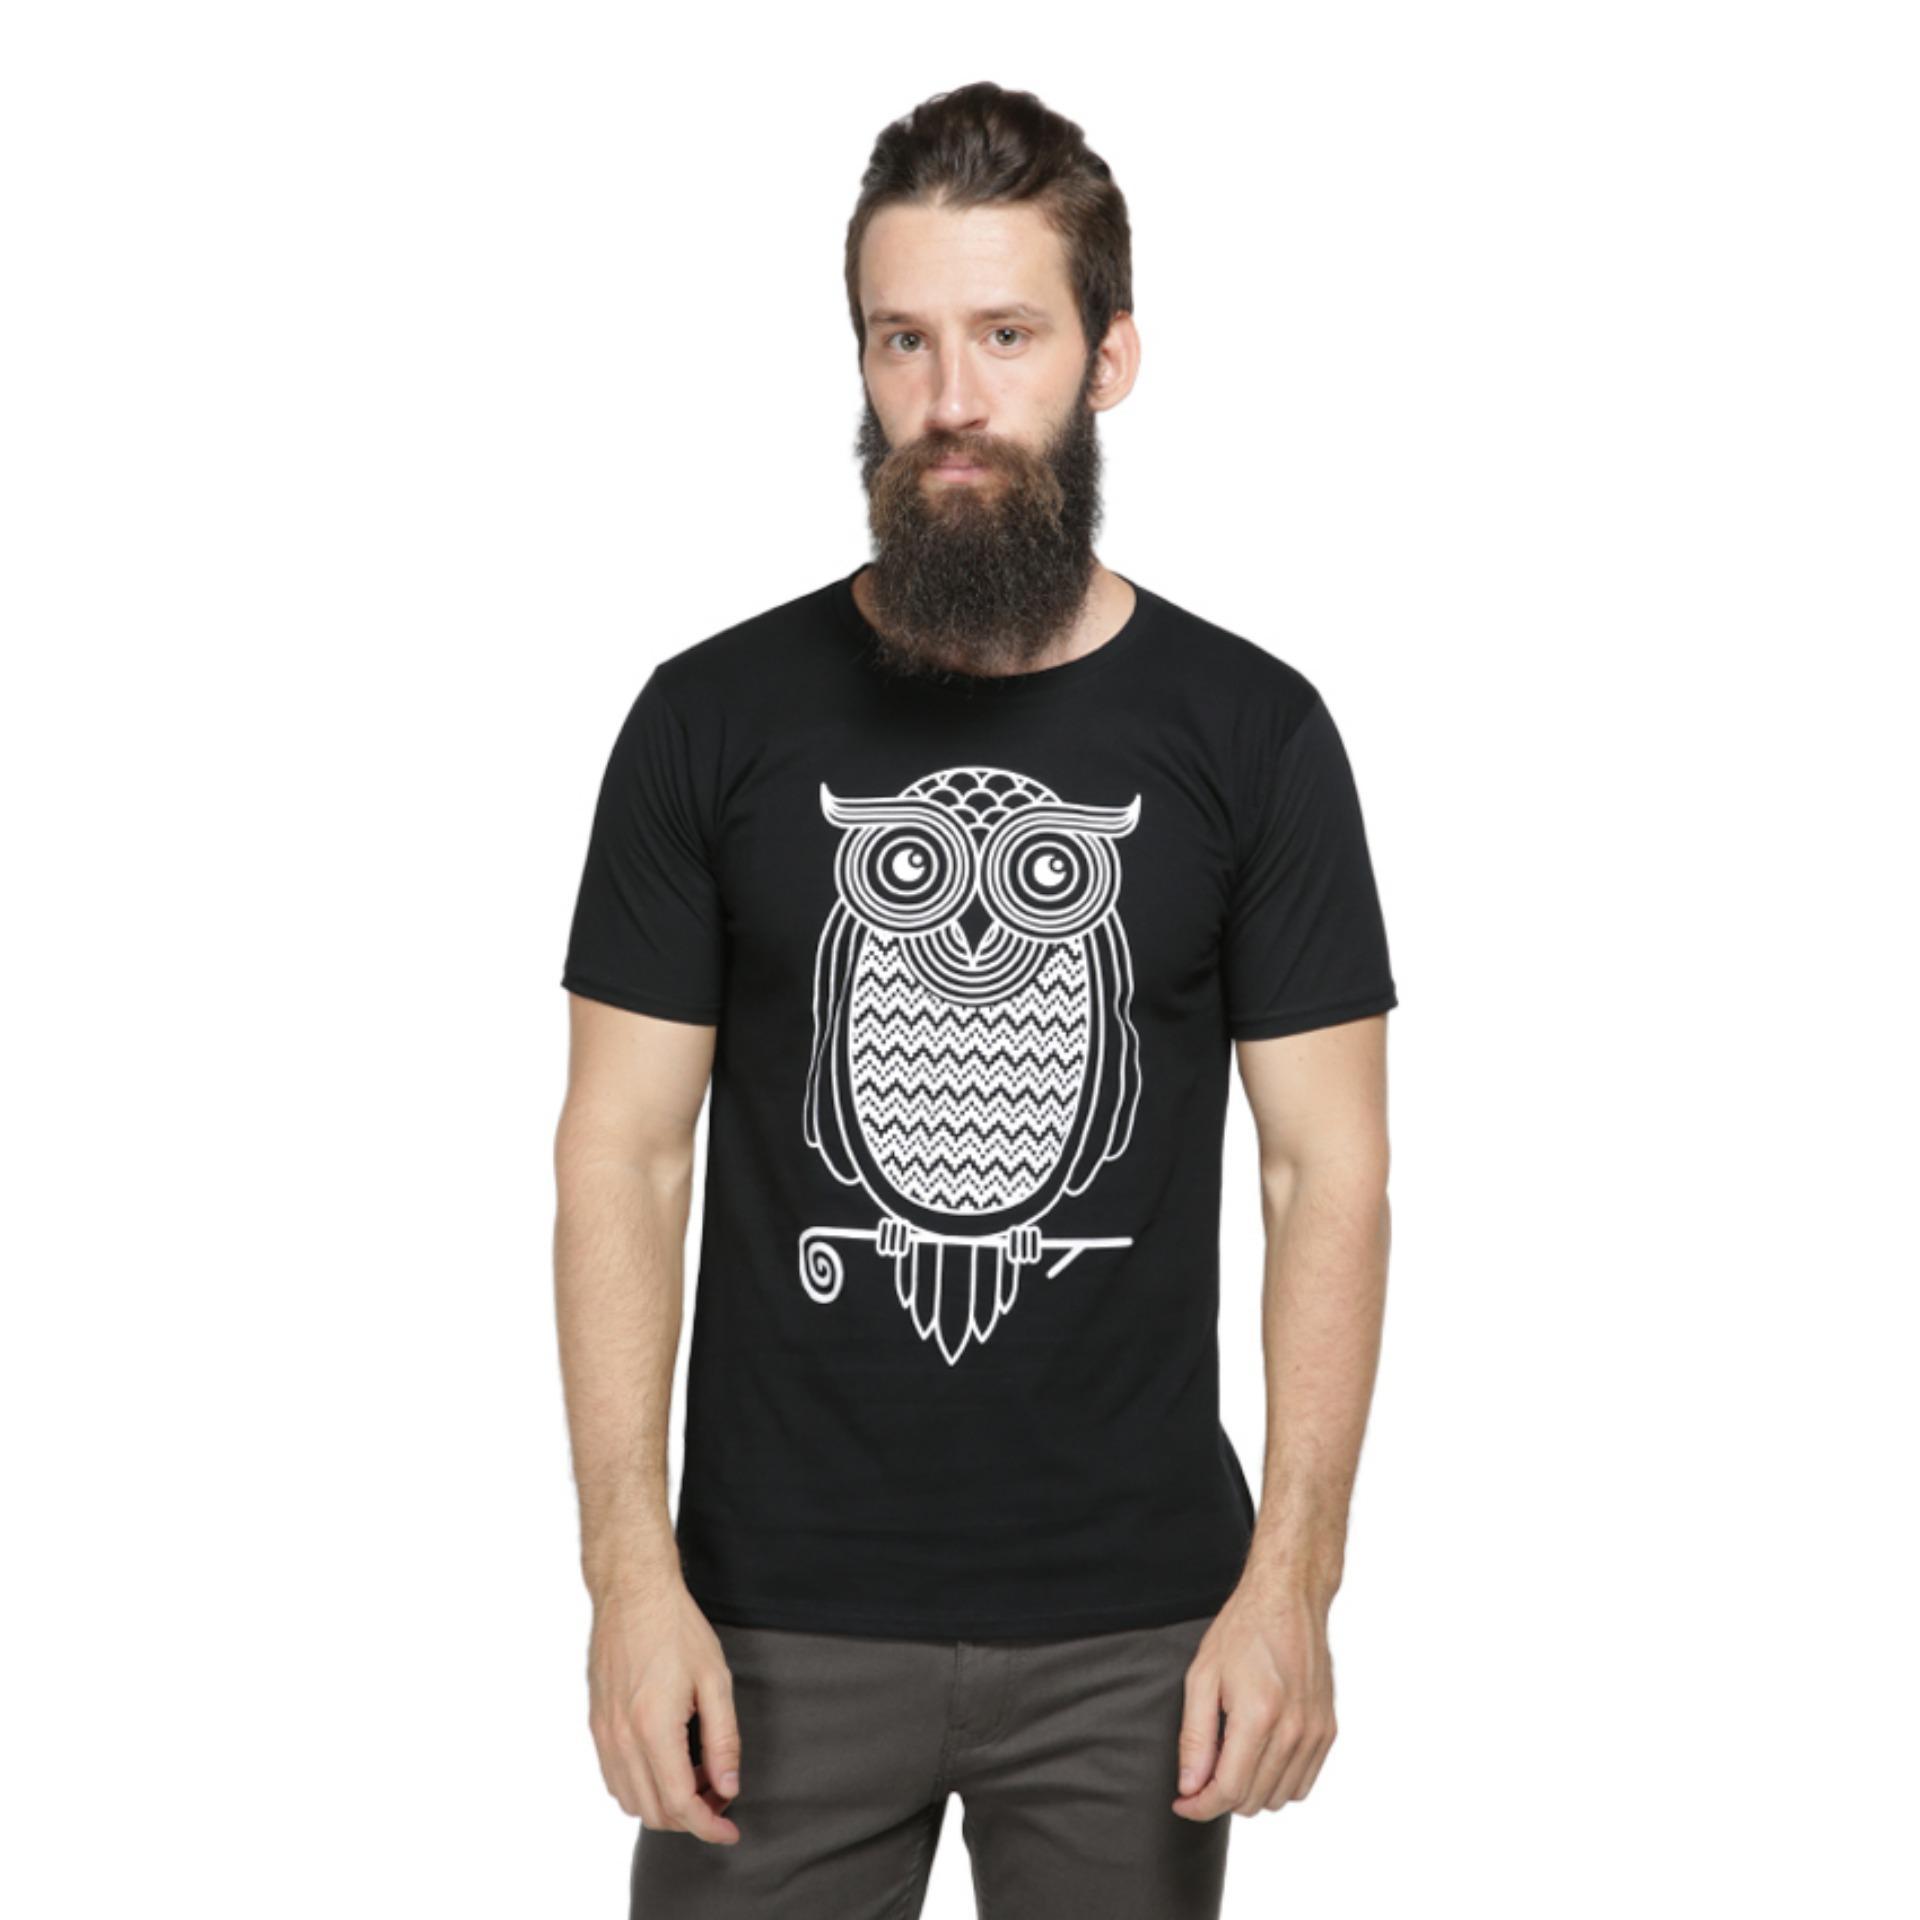 Vanwin - Kaos Distro Premium Pria Owl Kacamata - Hitam